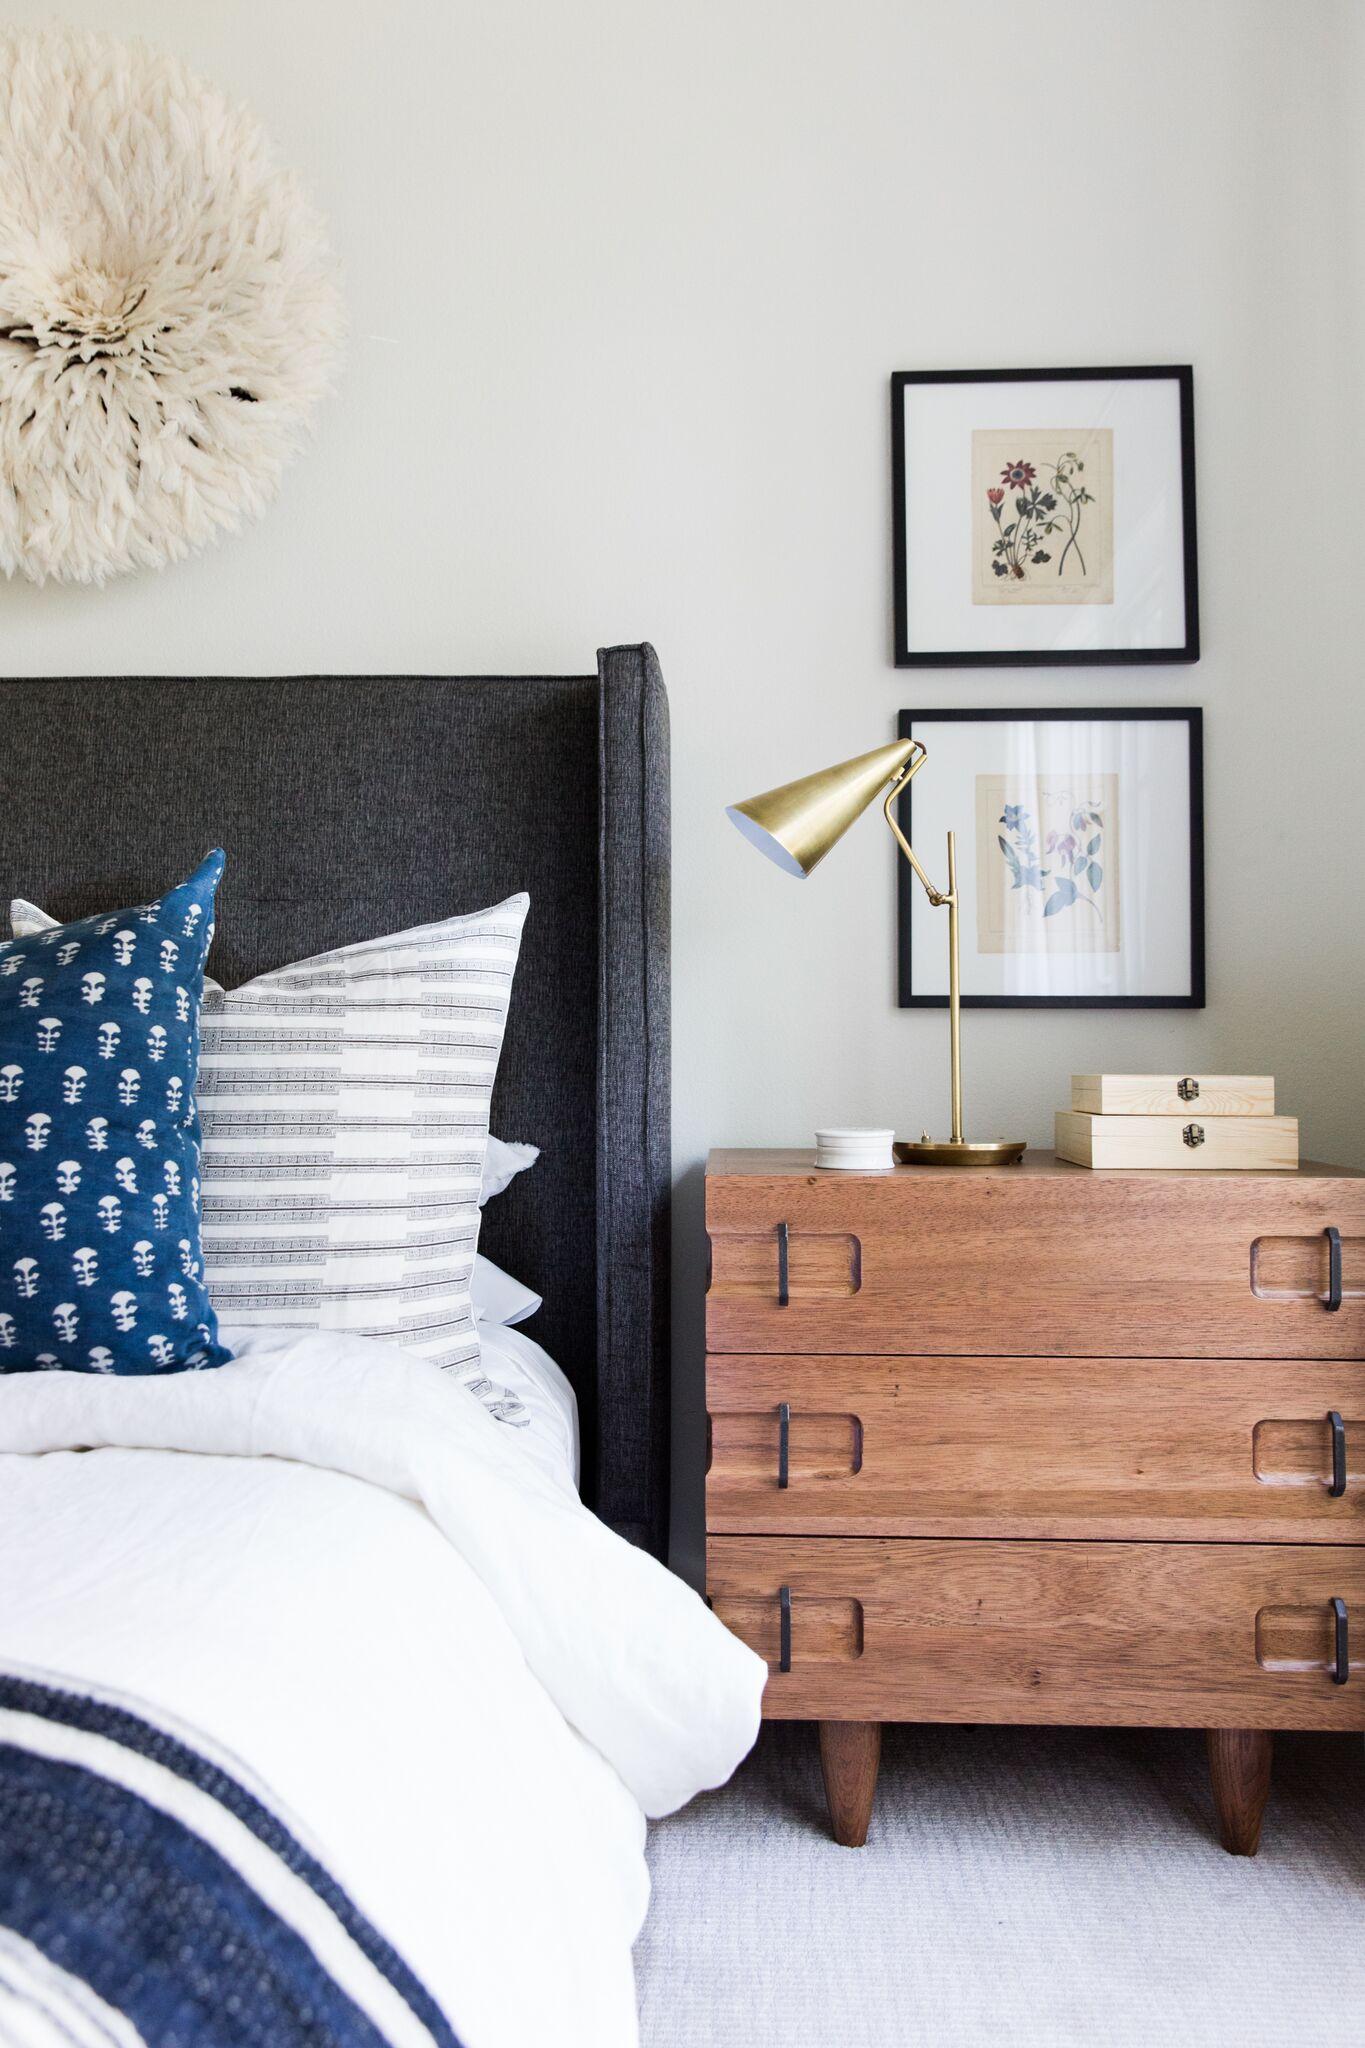 Coastal Bohemian Guest Bedroom with Vintage Rug and Botanical Prints